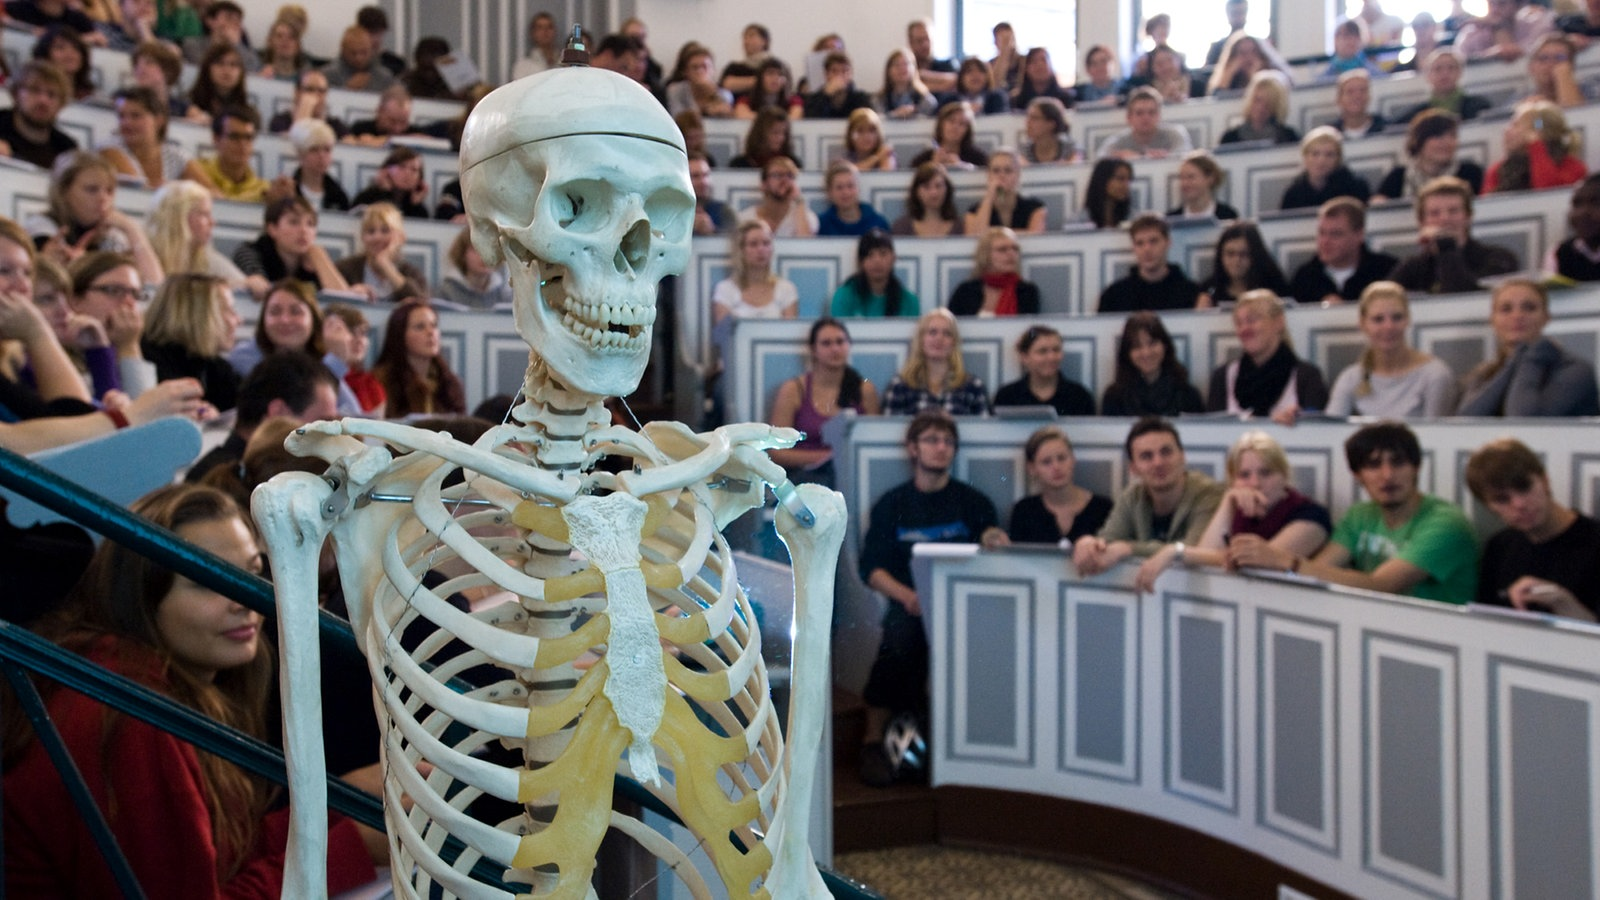 Medizin-Studiengang-an-der-Uni-Bielefeld-startet-im-Herbst